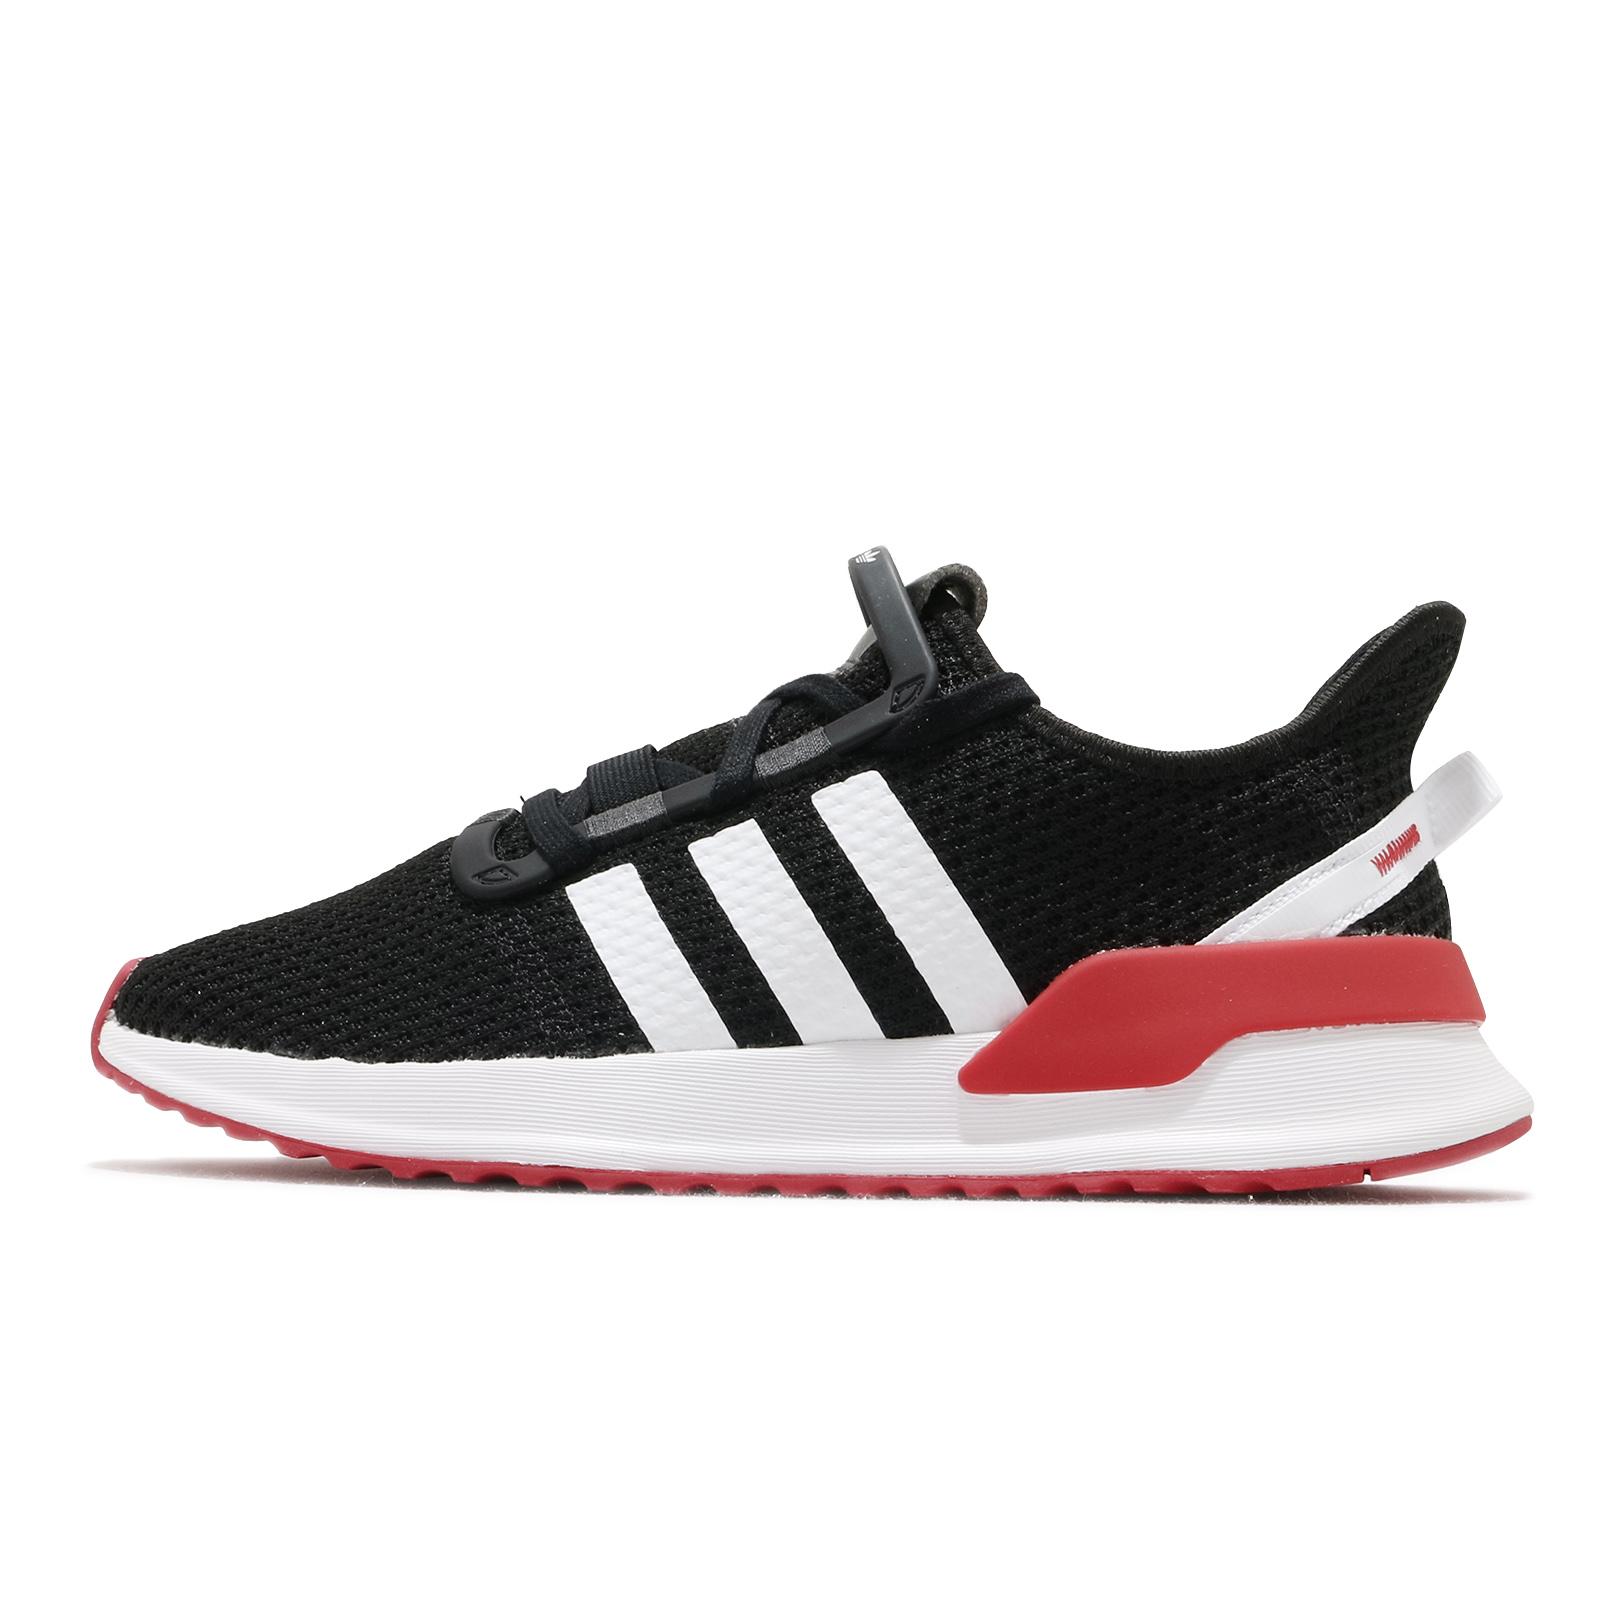 adidas 休閒鞋 U_Path Run 黑 白 紅 愛迪達 運動鞋 三葉草 男鞋 女鞋 【ACS】 FX0102